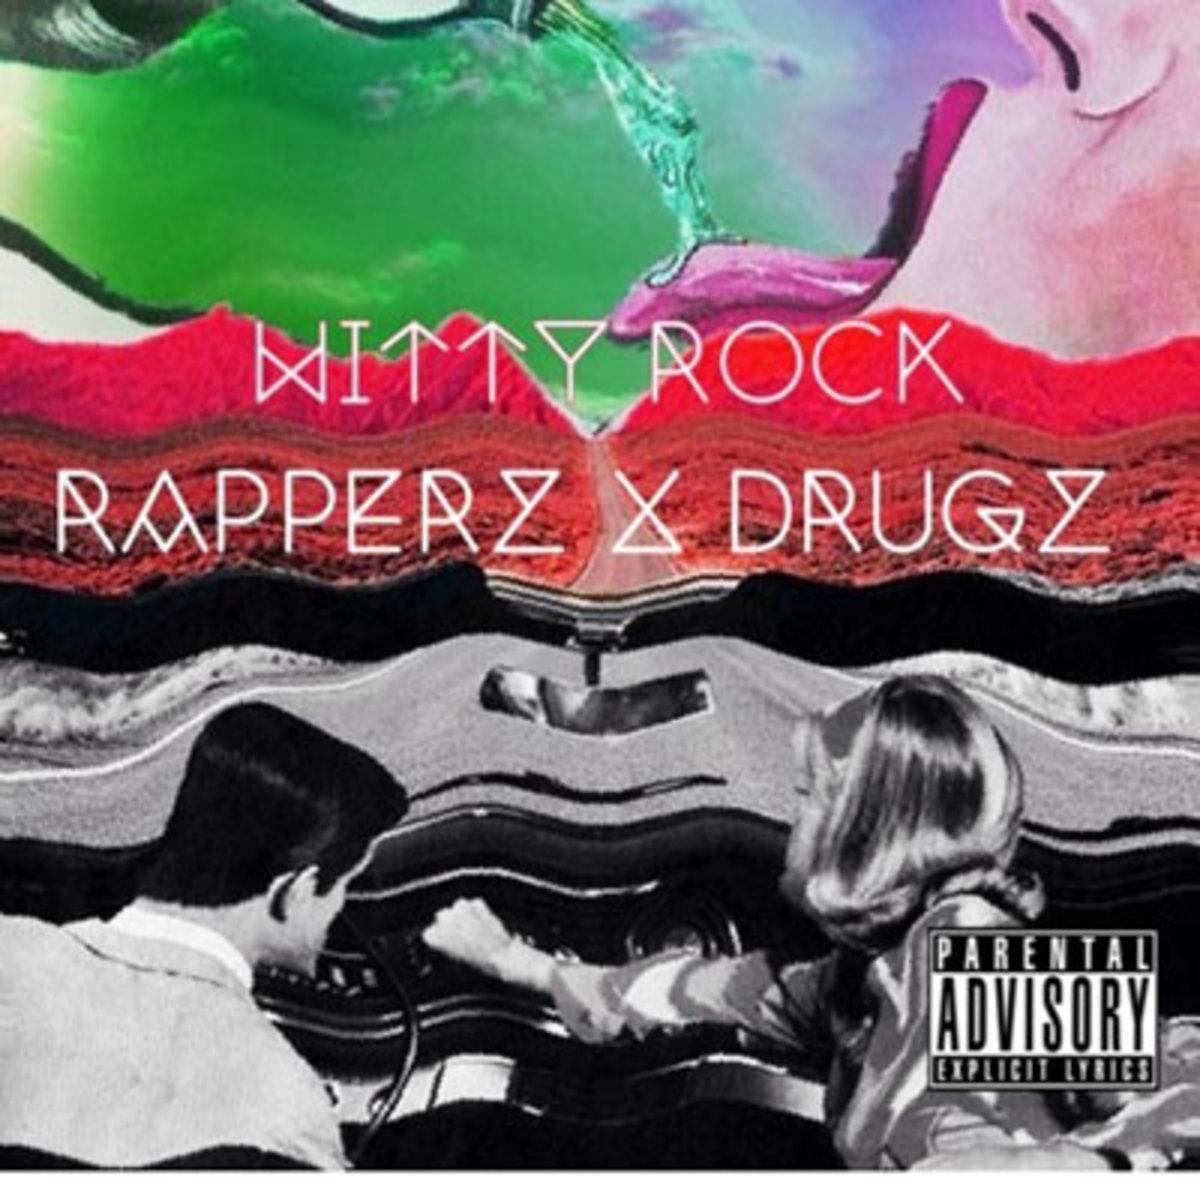 wittyrock-rapperzndrugz.jpg